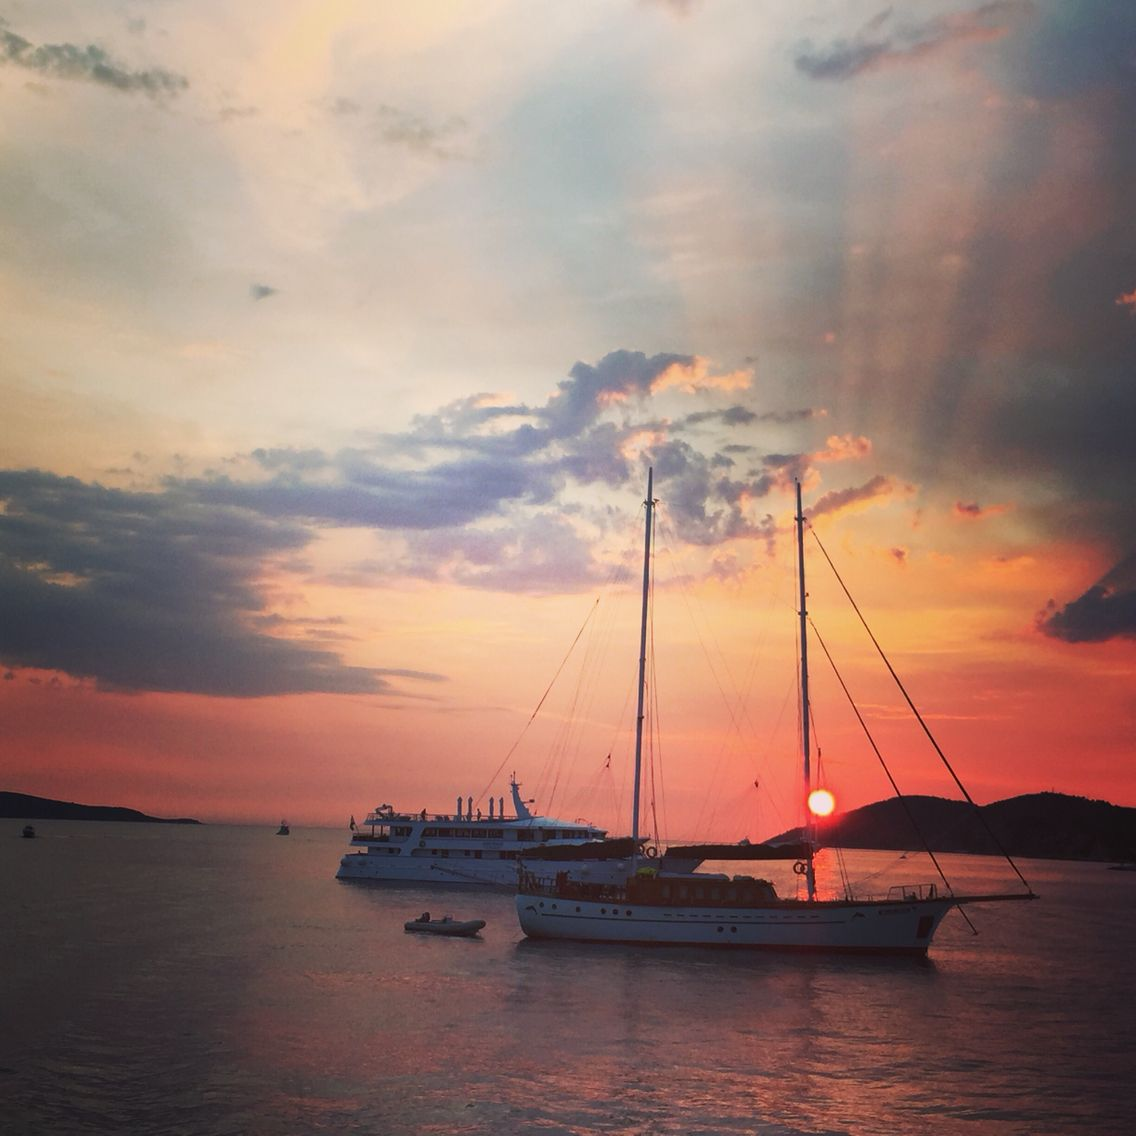 In the middle of the Adriatic Sea of the Dalmatia coast in Croatia.